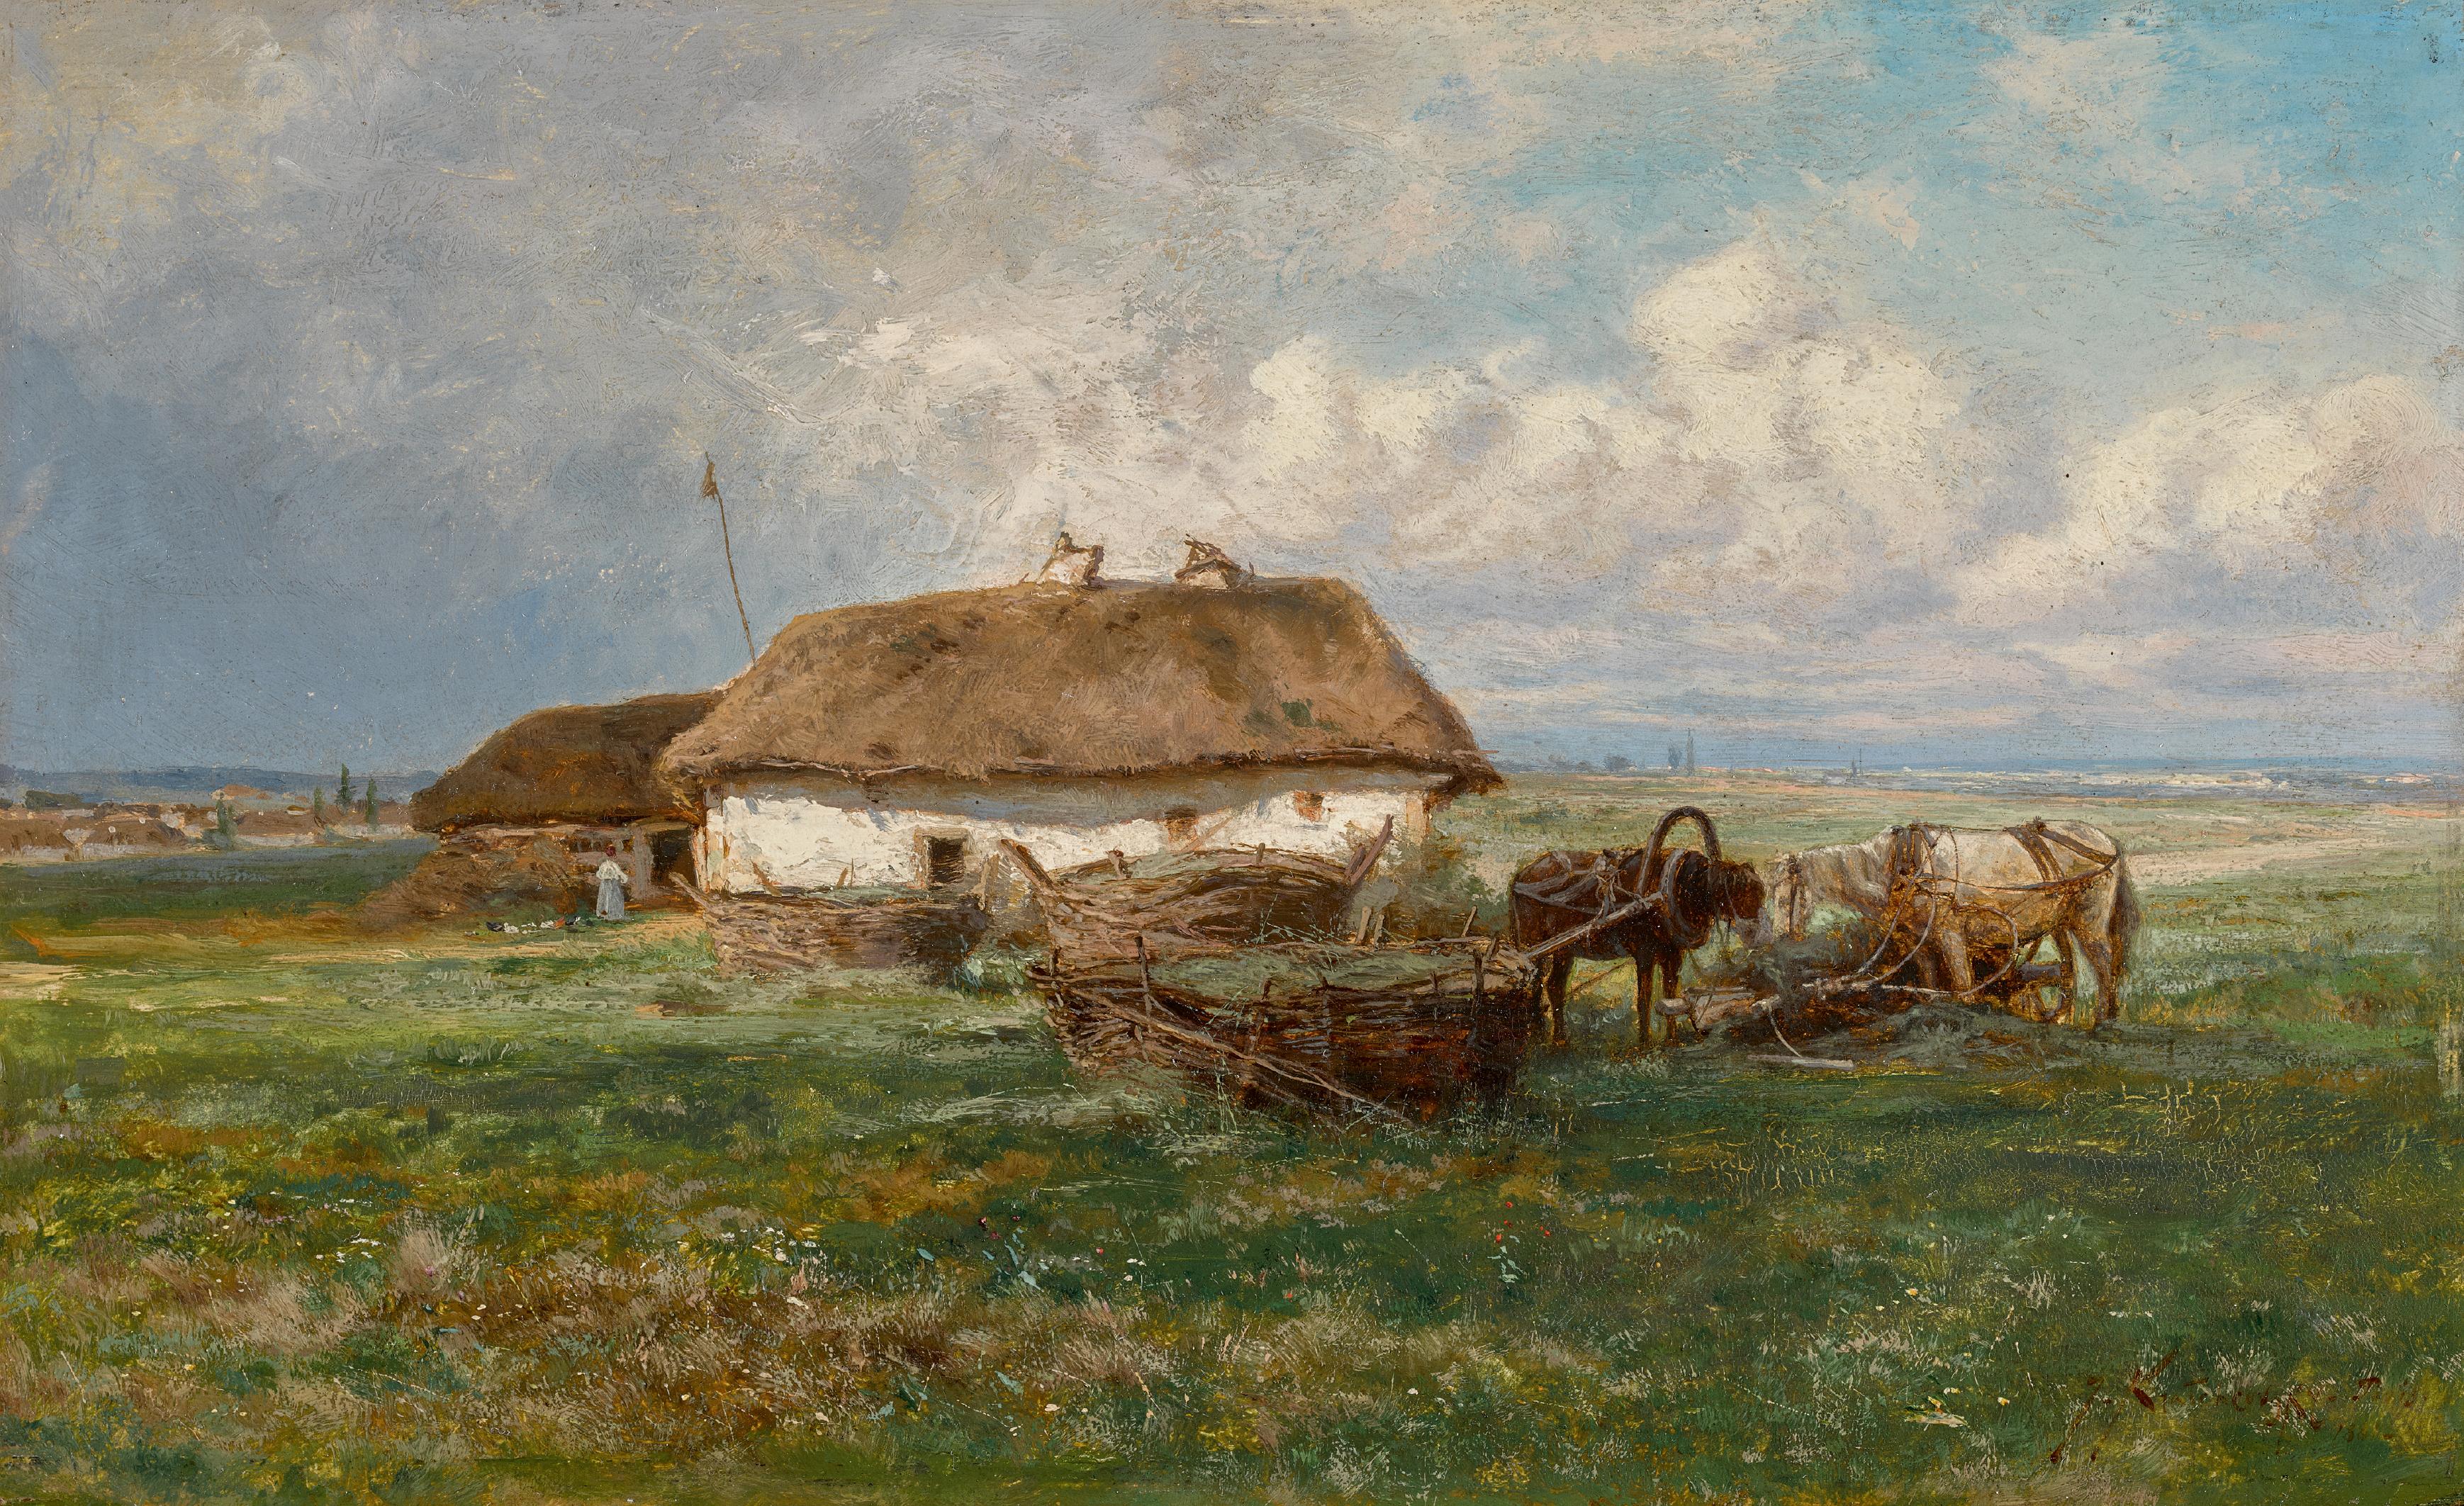 IOSIF EVSTAFIEVICH KRACHKOVSKY | Homestead with Horses